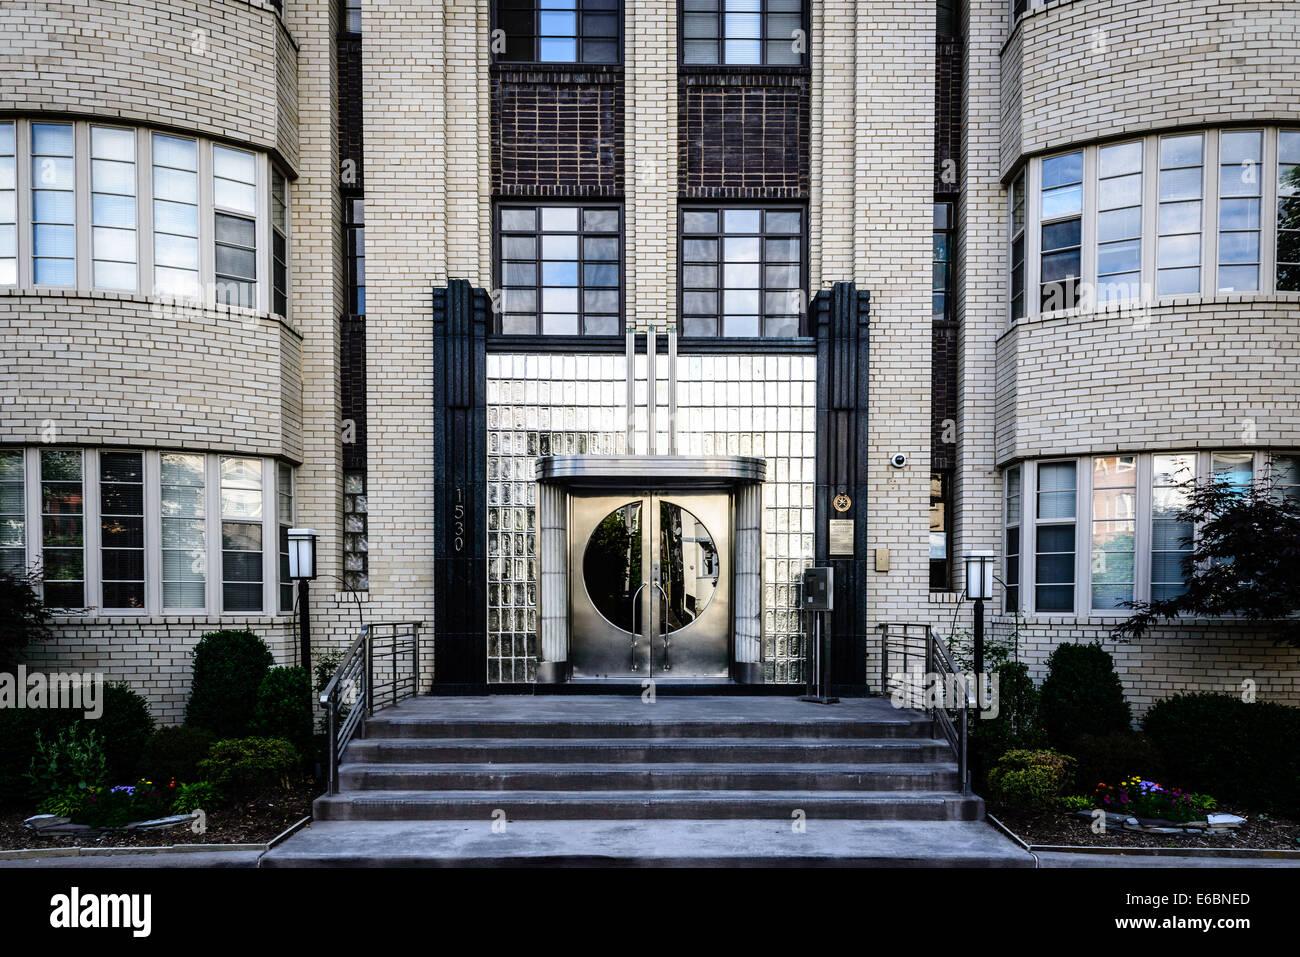 Amazing Hightowers Apartments, 1530 16th Street NW, Washington DC